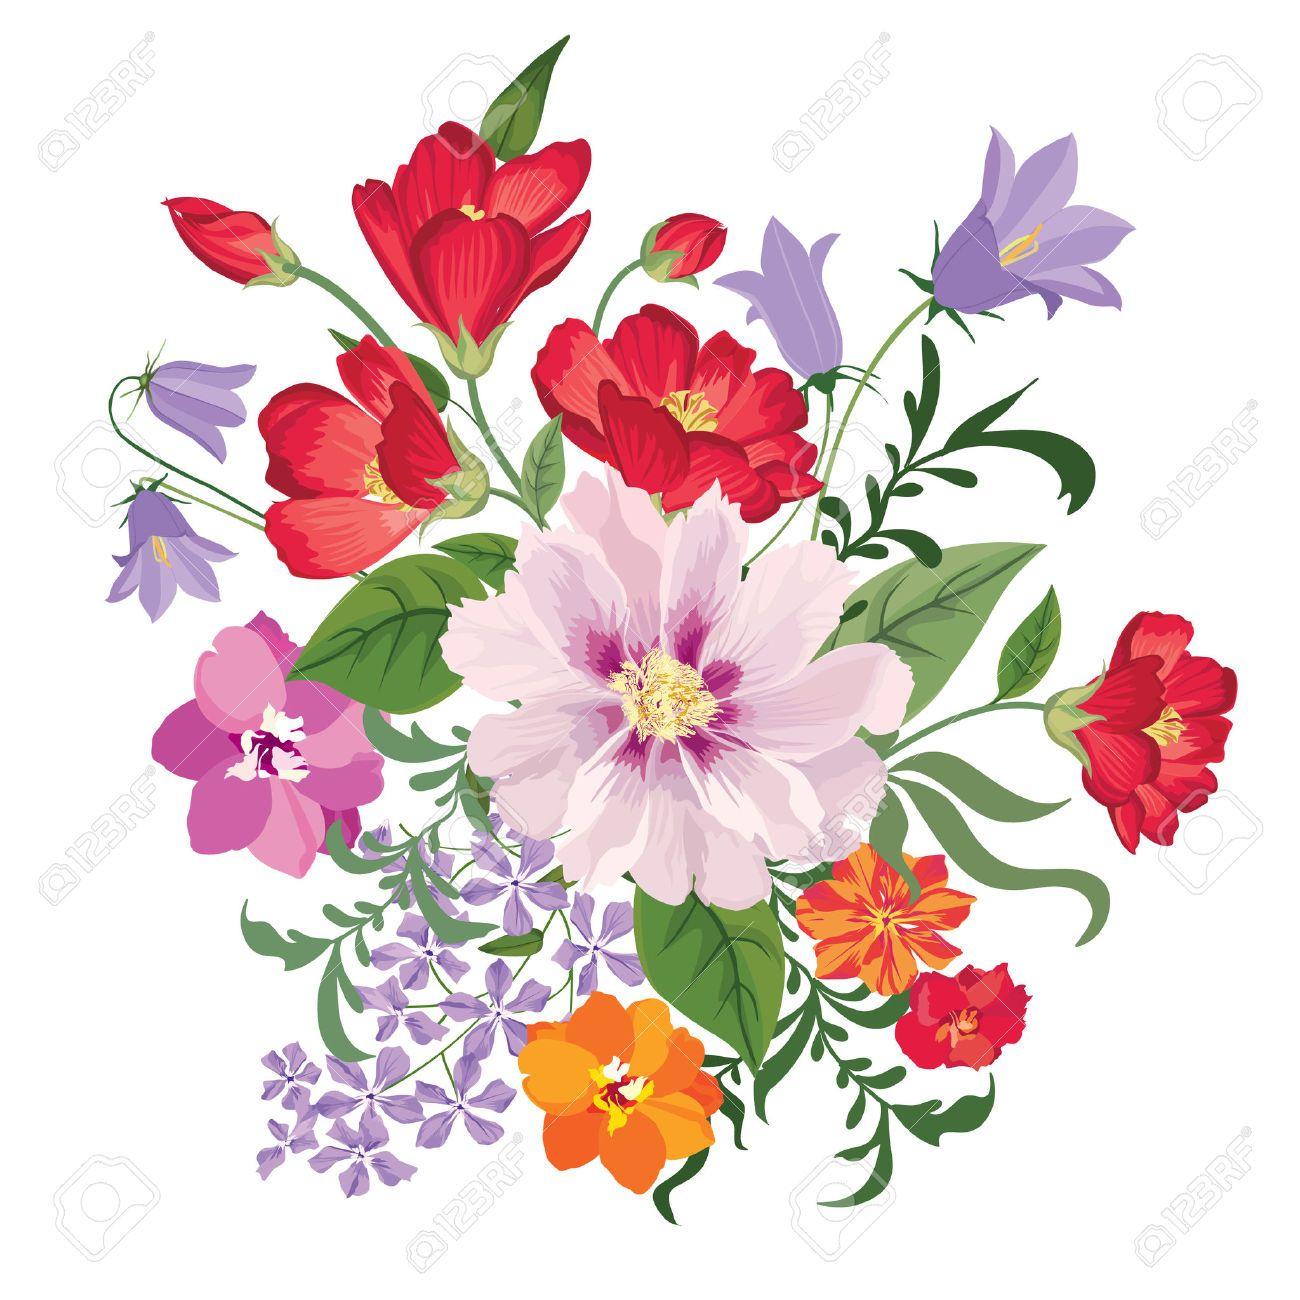 46073593 flower bouquet floral frame flourish greeting card blooming flowers isolated on white - Bouquet de fleurs des champs ...